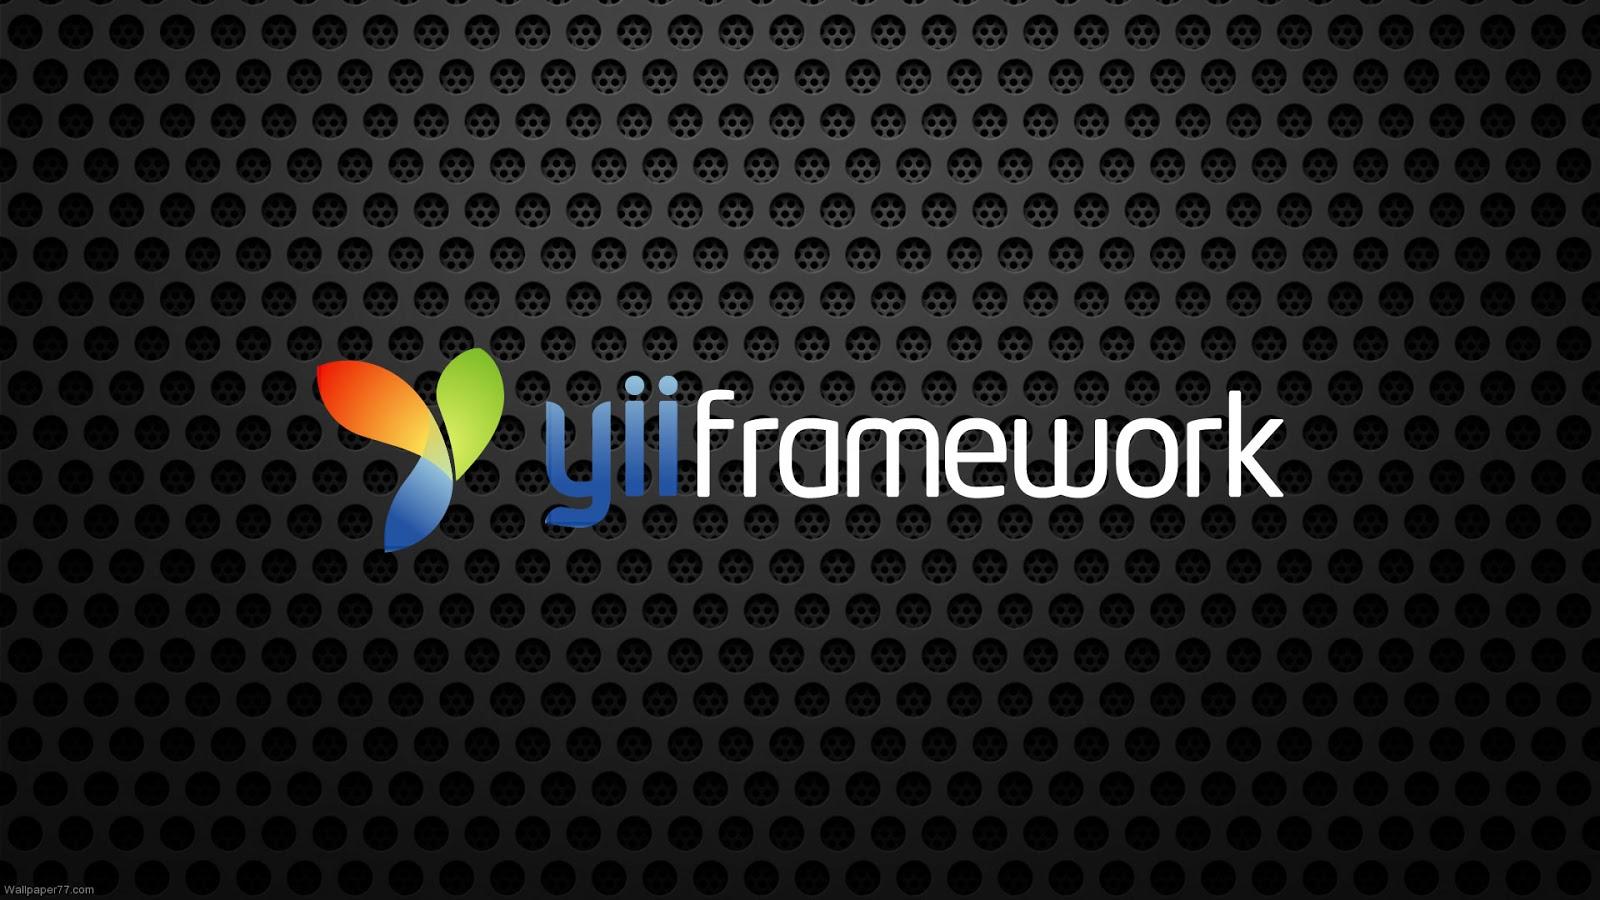 Yii Framework - opensource dan gratis!